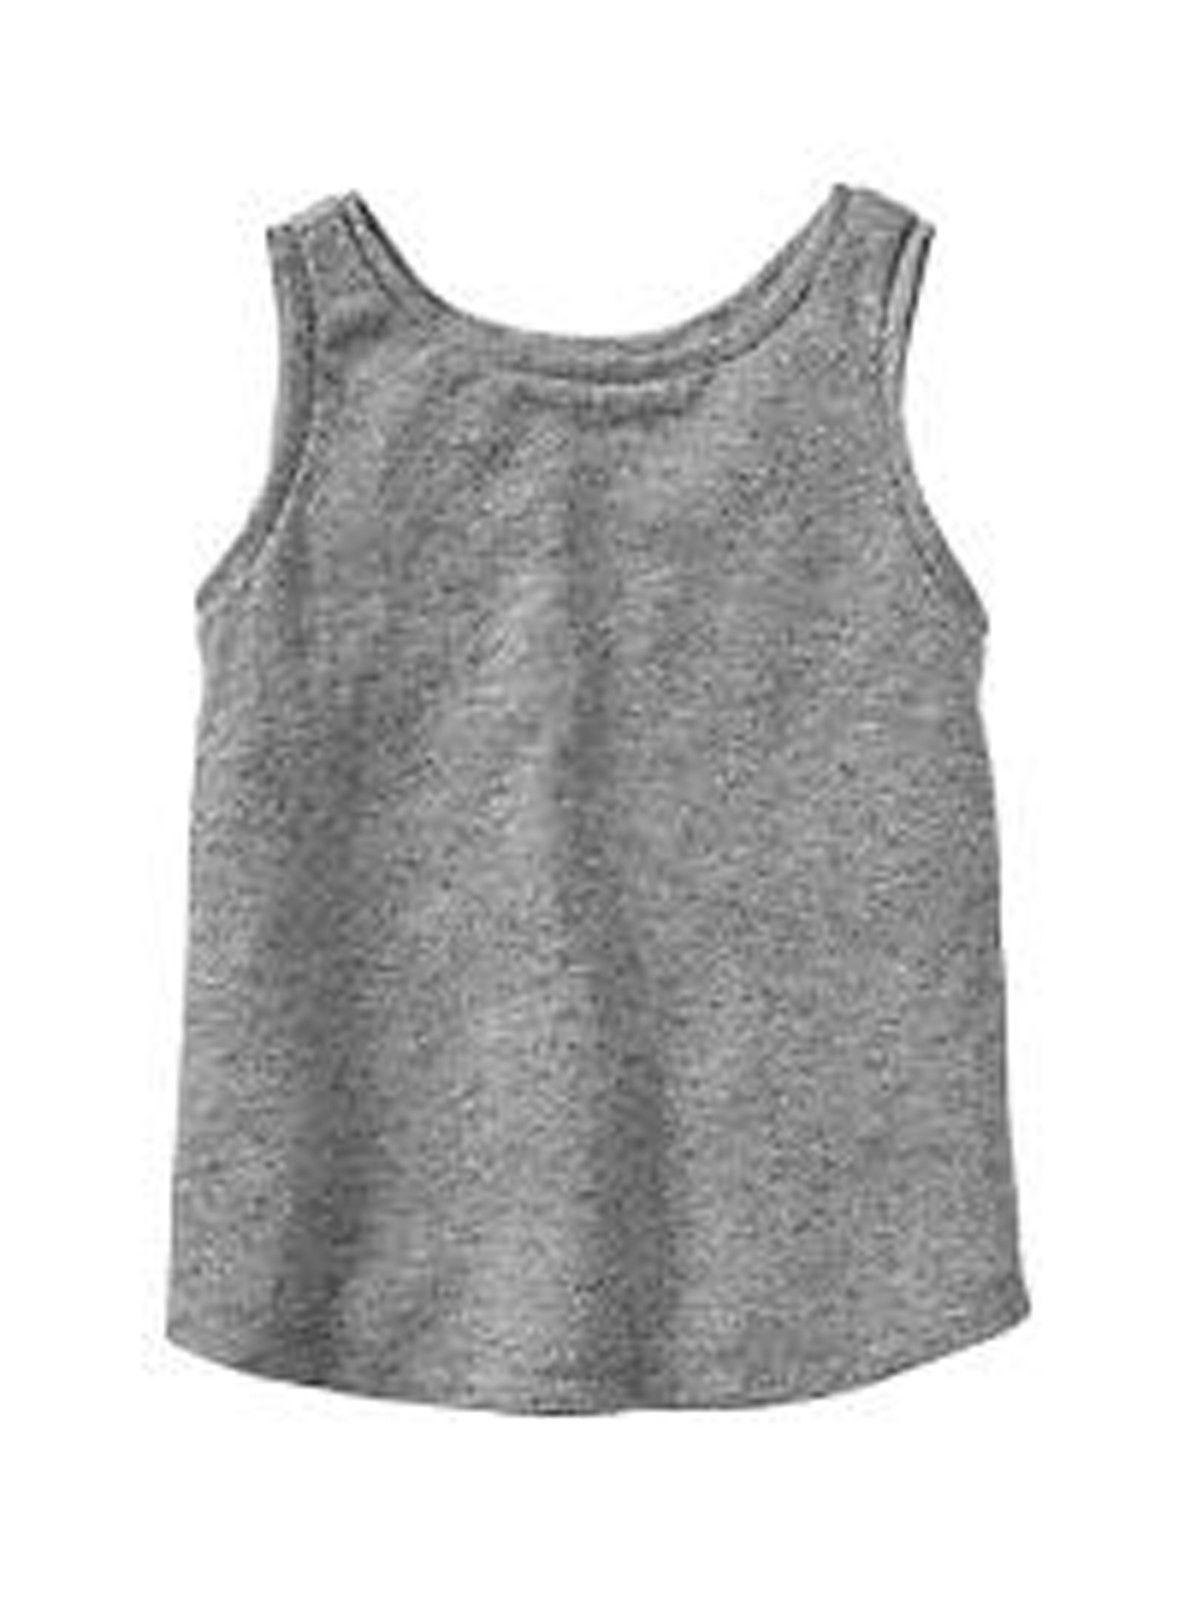 GAP Kids Girls Tank Top Tee 8 10 Marled Slub Sleeveless Grey Rugged Knit New